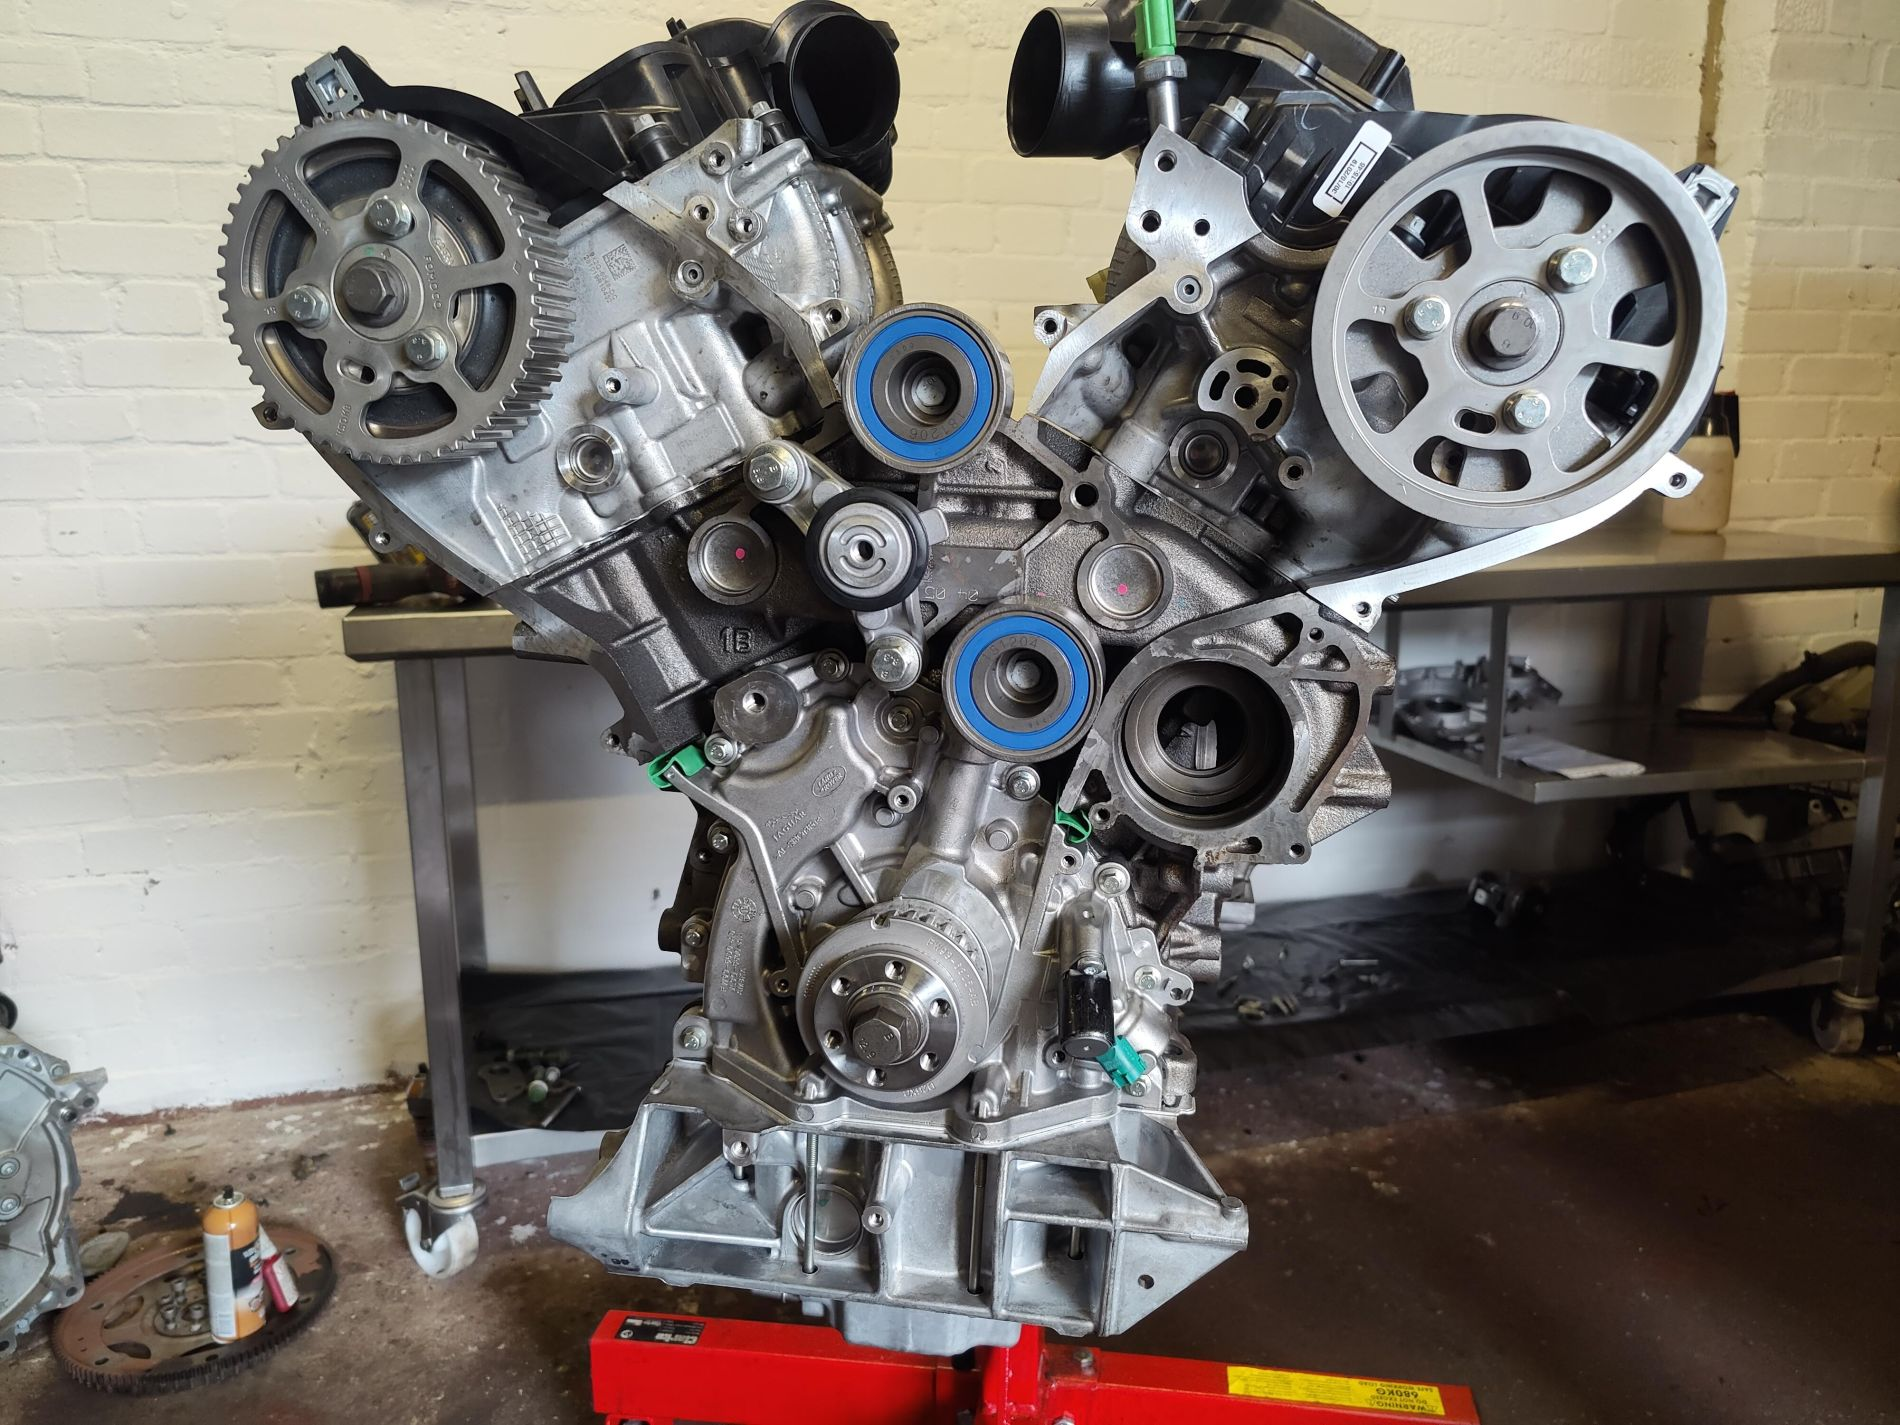 range rover 3.0 engine